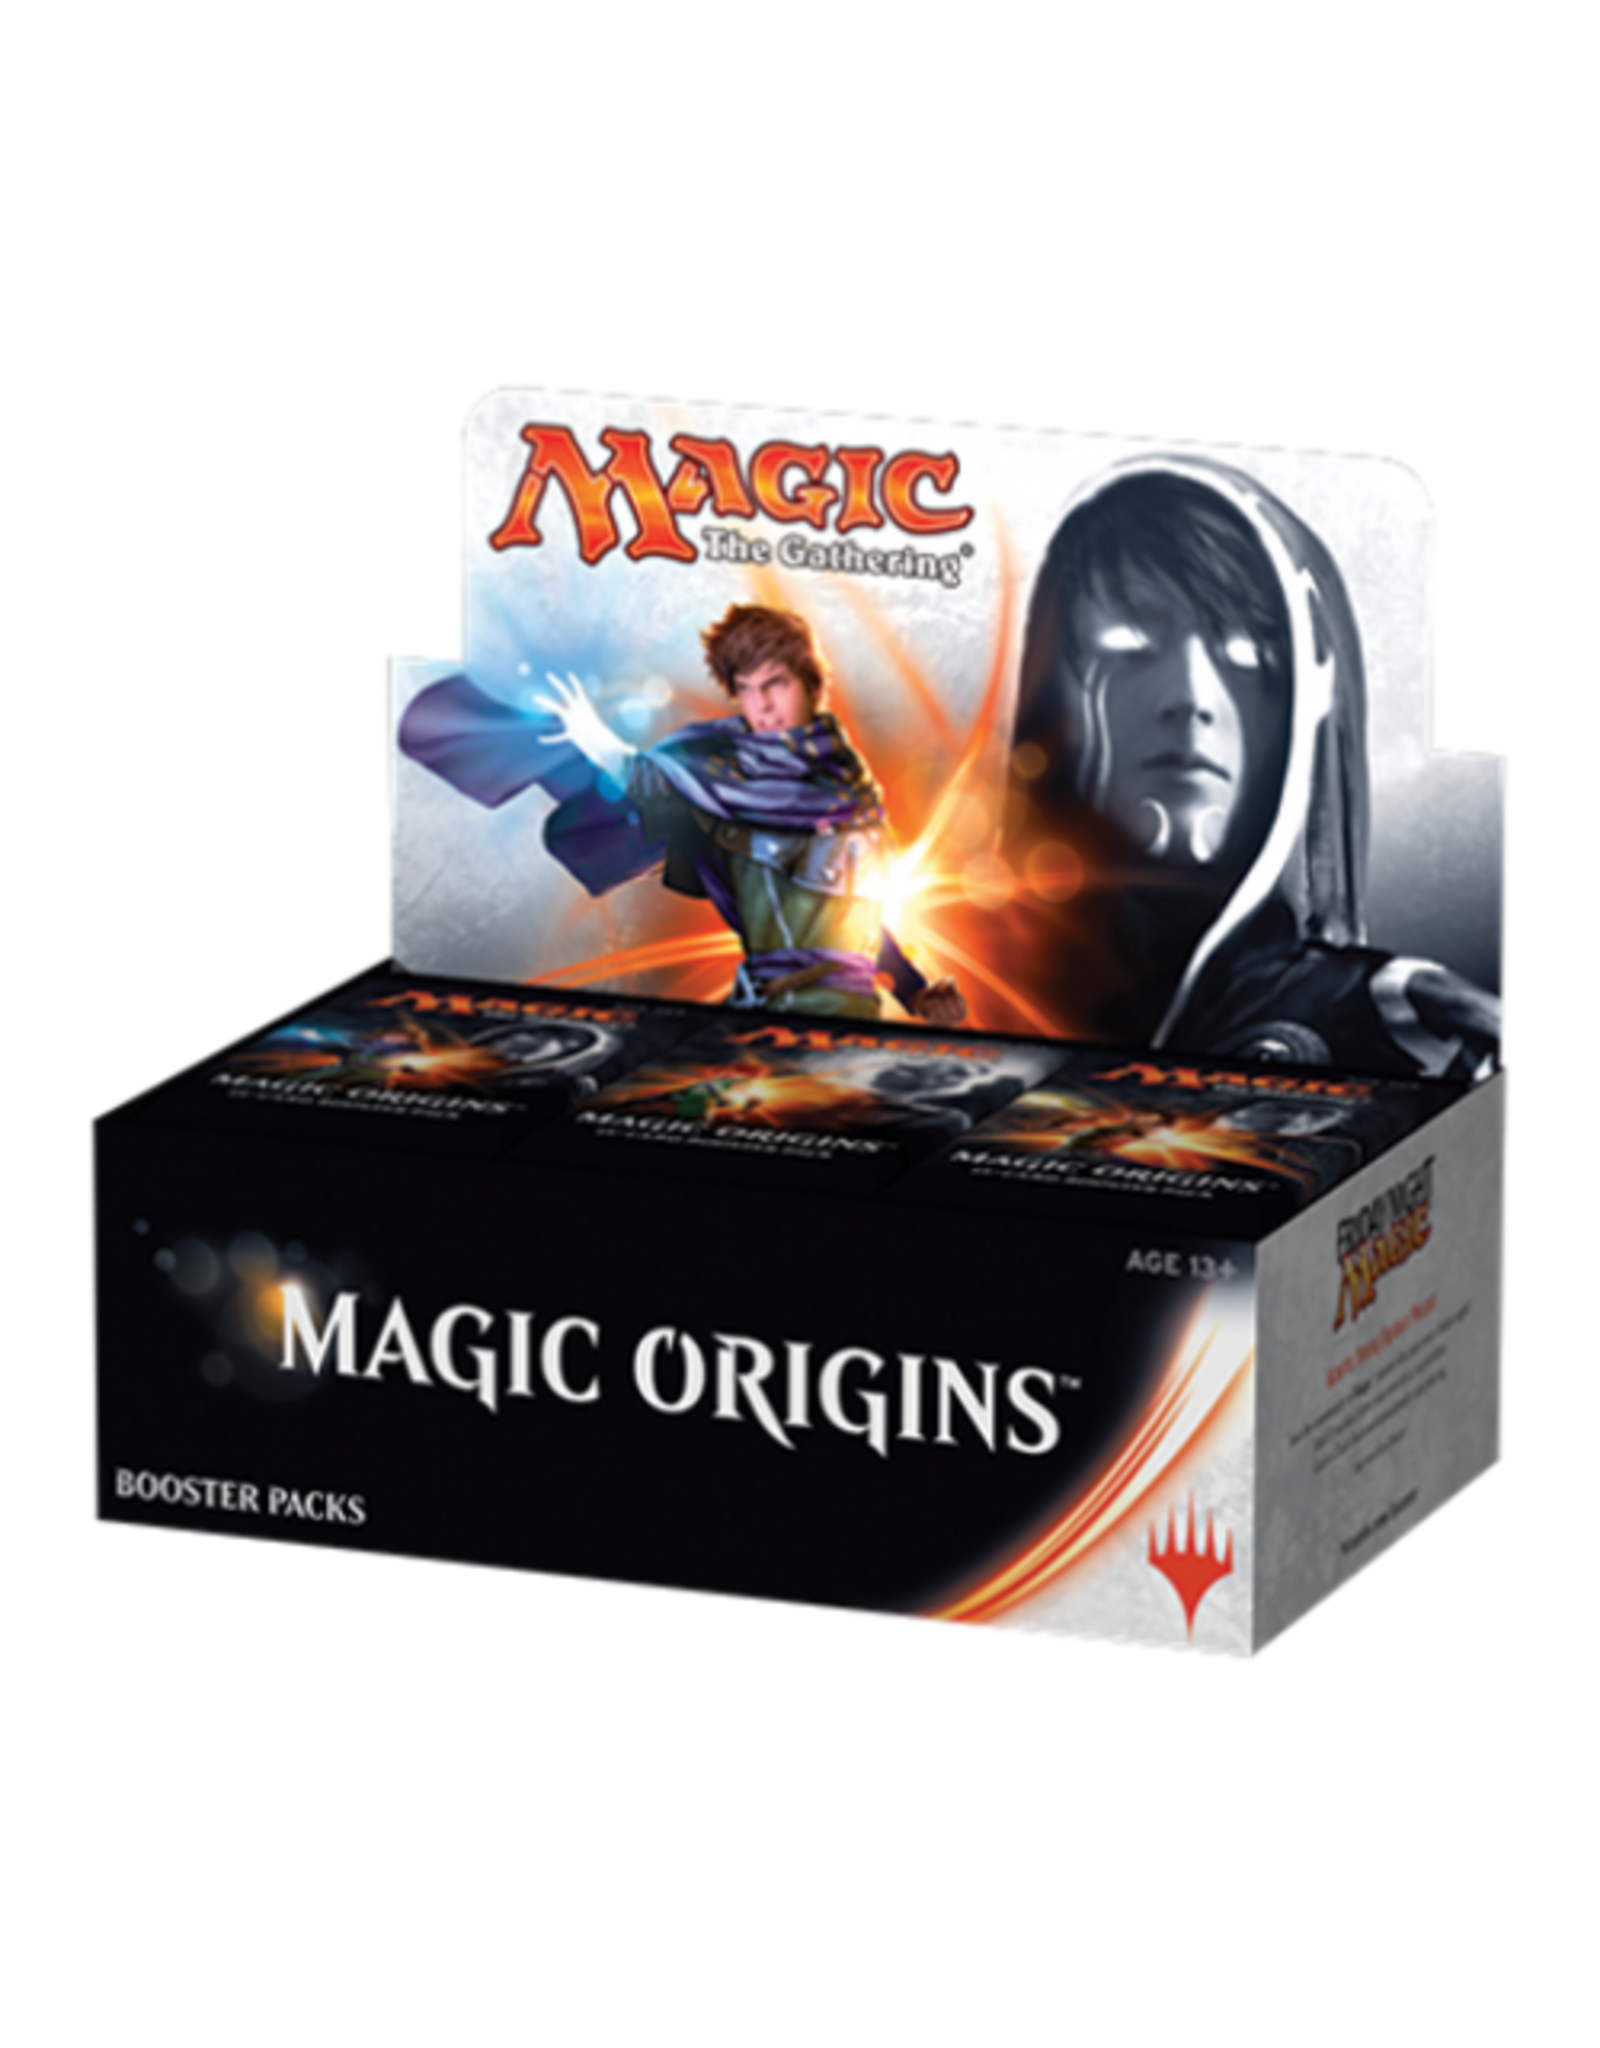 Wizards of the Coast Magic Origins Booster Box